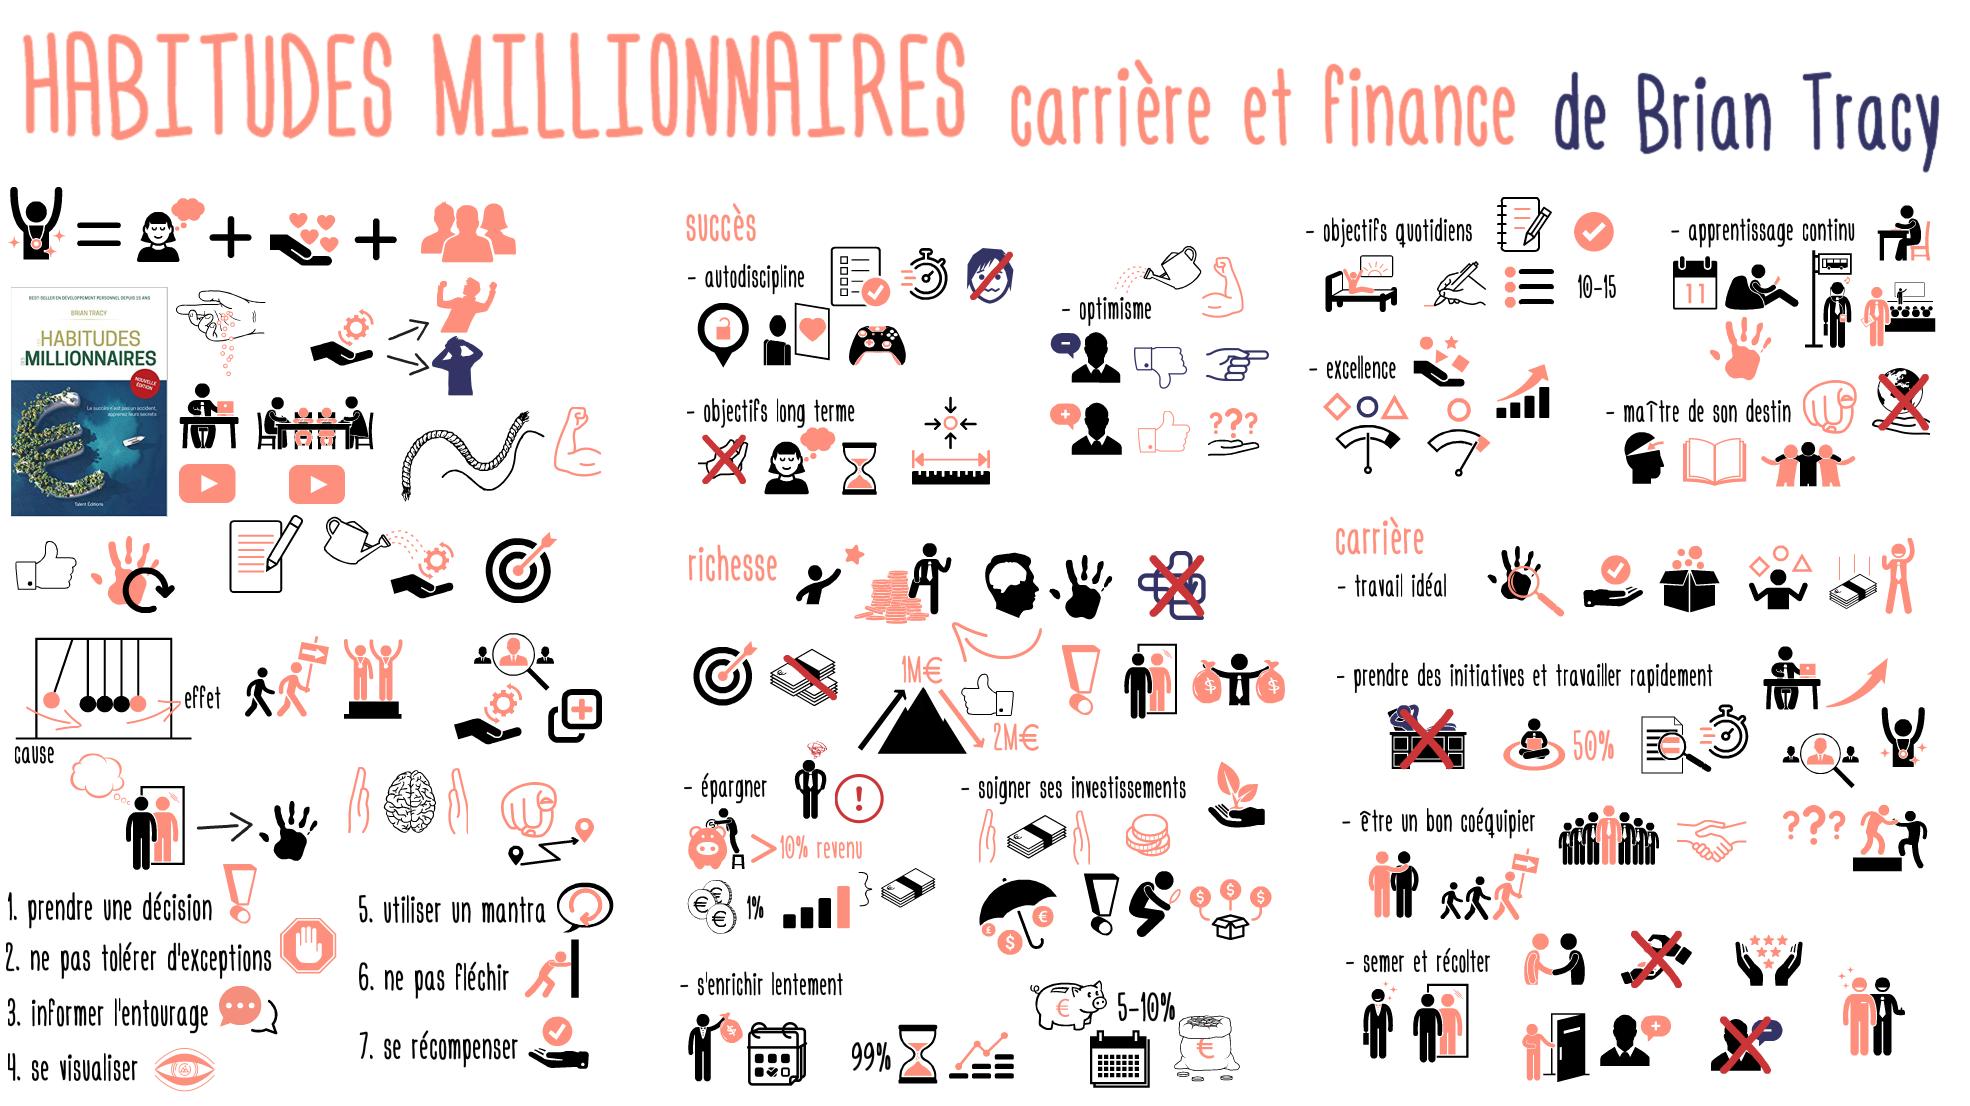 Habitudes Millionnaires Pro